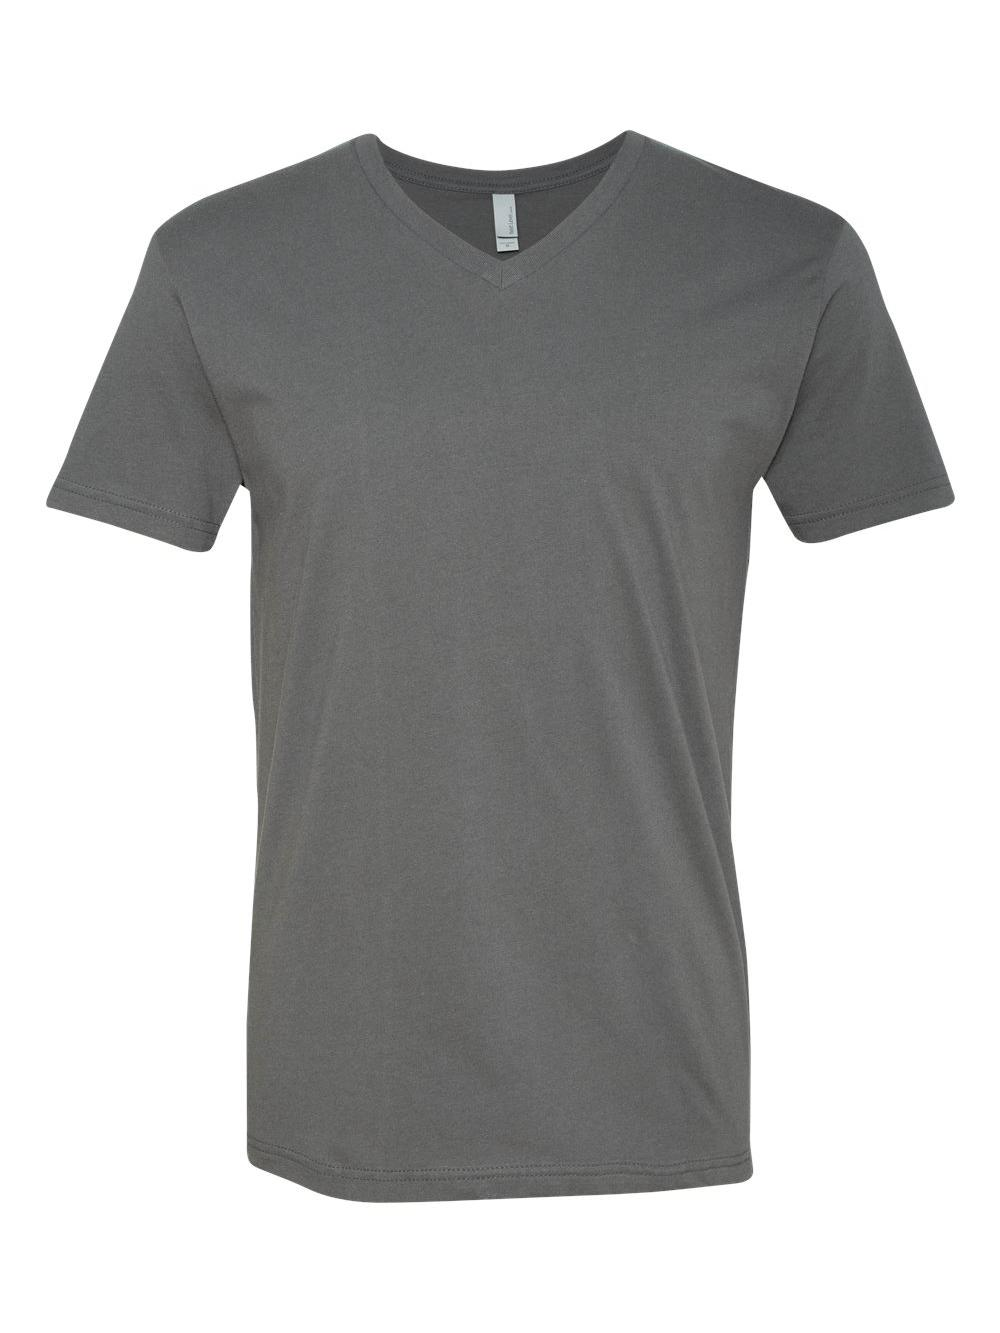 Next-Level-Premium-Short-Sleeve-V-3200 thumbnail 15